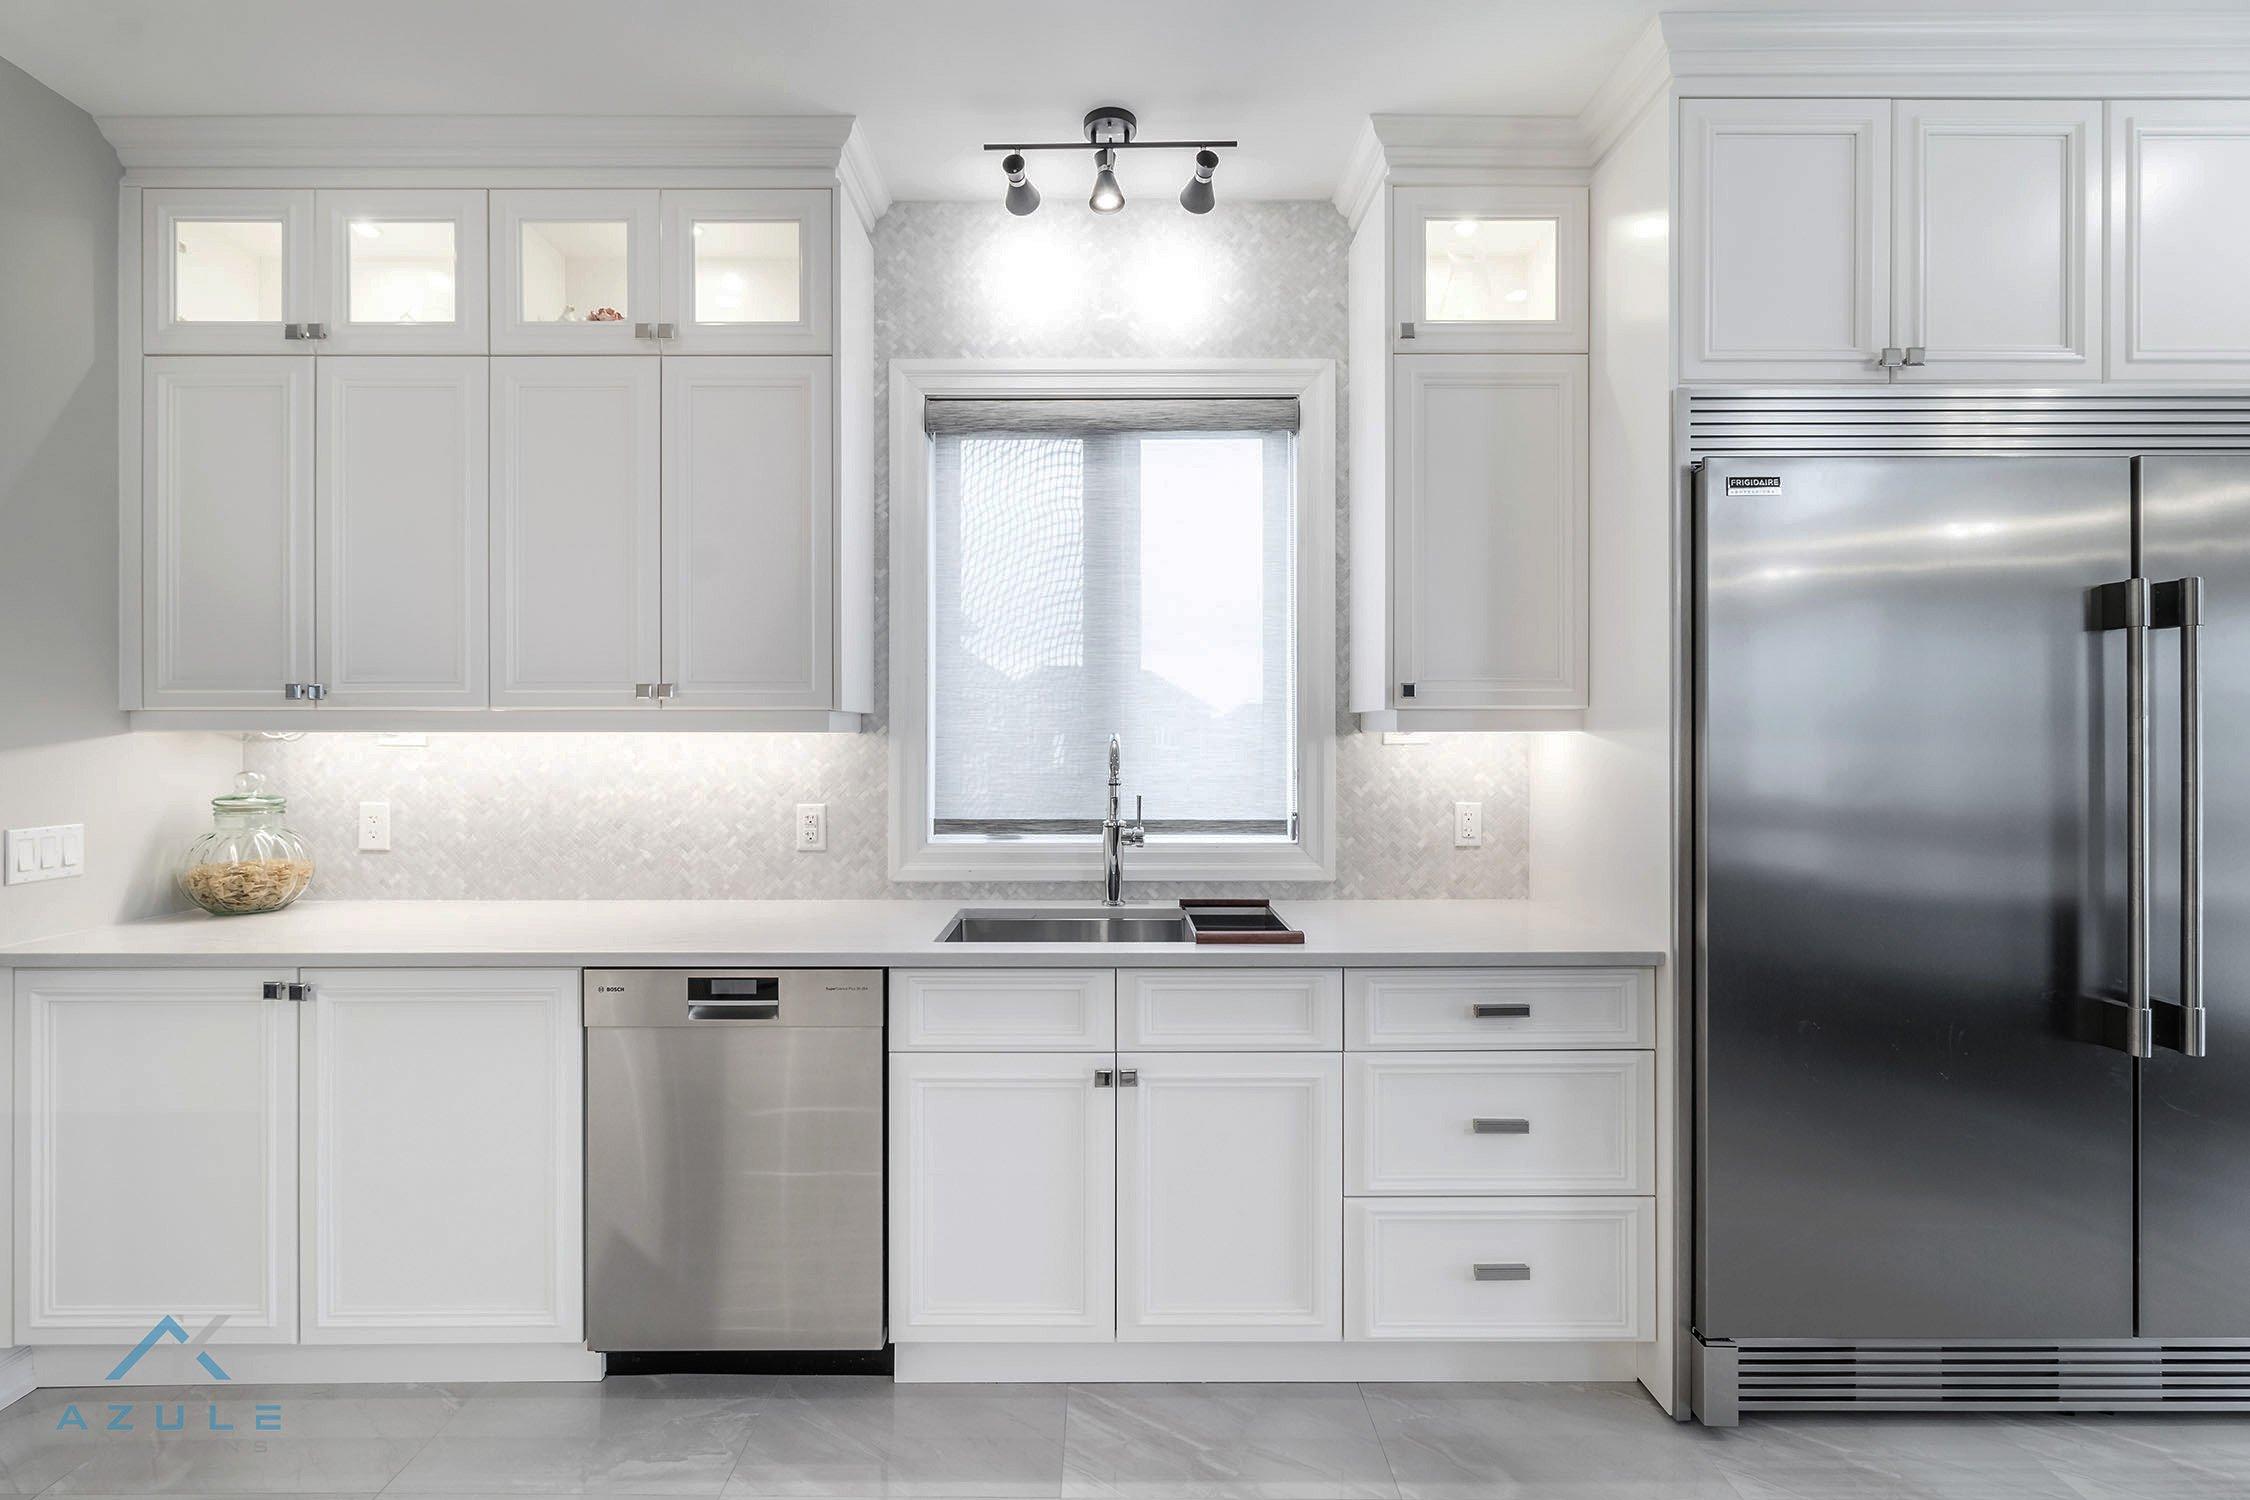 New Kitchen Designs Hamilton Azule Kitchens